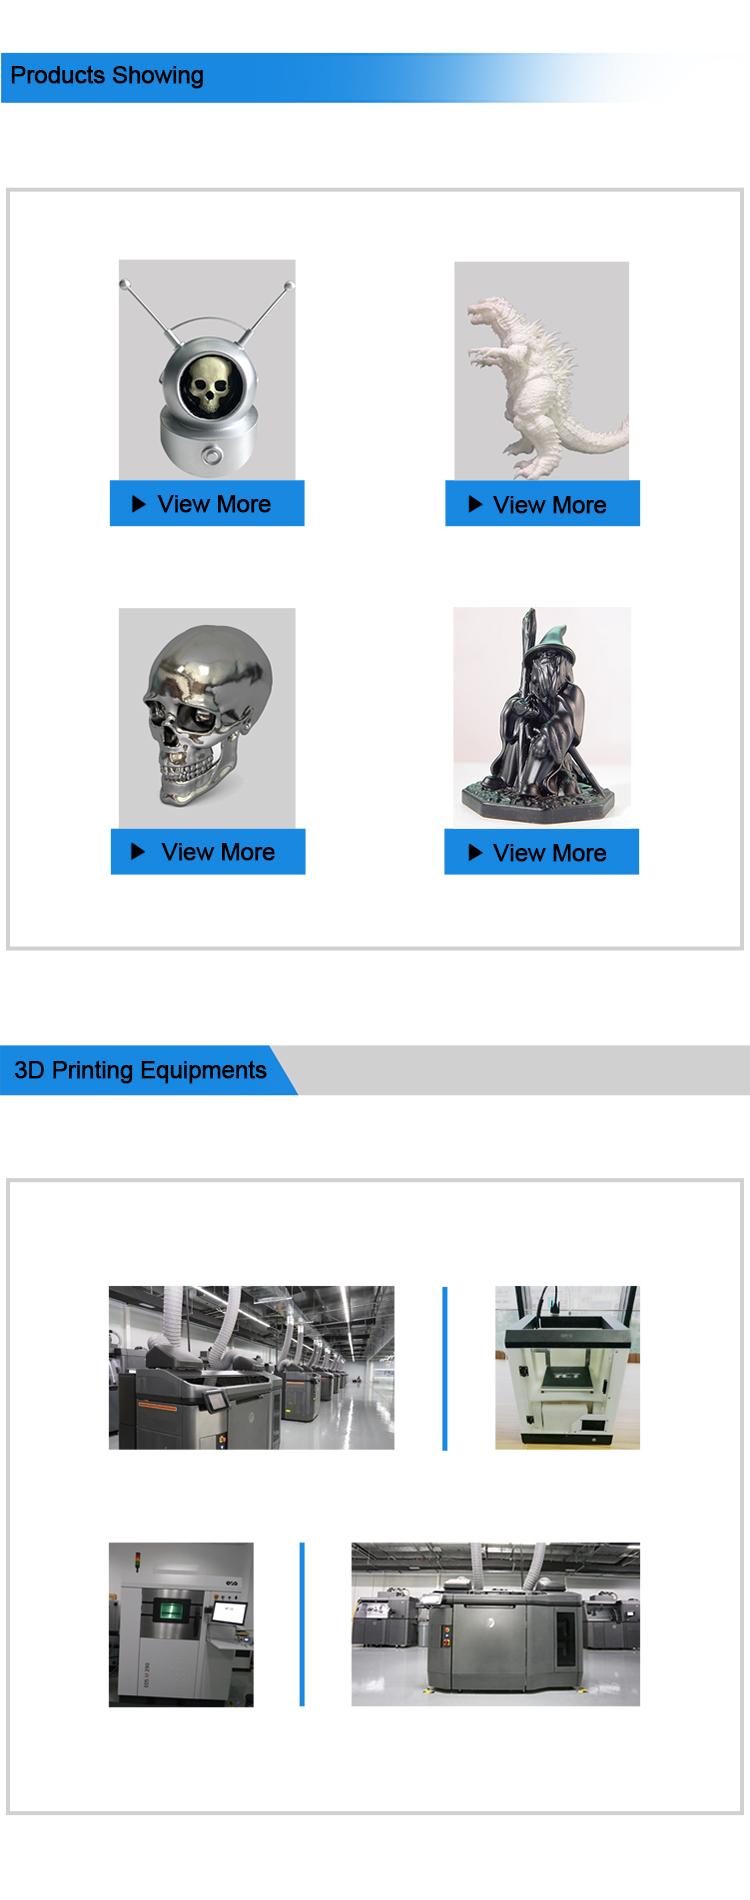 Stereolithography SLA SLS הדפסת 3D הדפסת ודיגום מהיר שירות עבור חלקי רכב/חשמל מוצר/יומי אבזרים